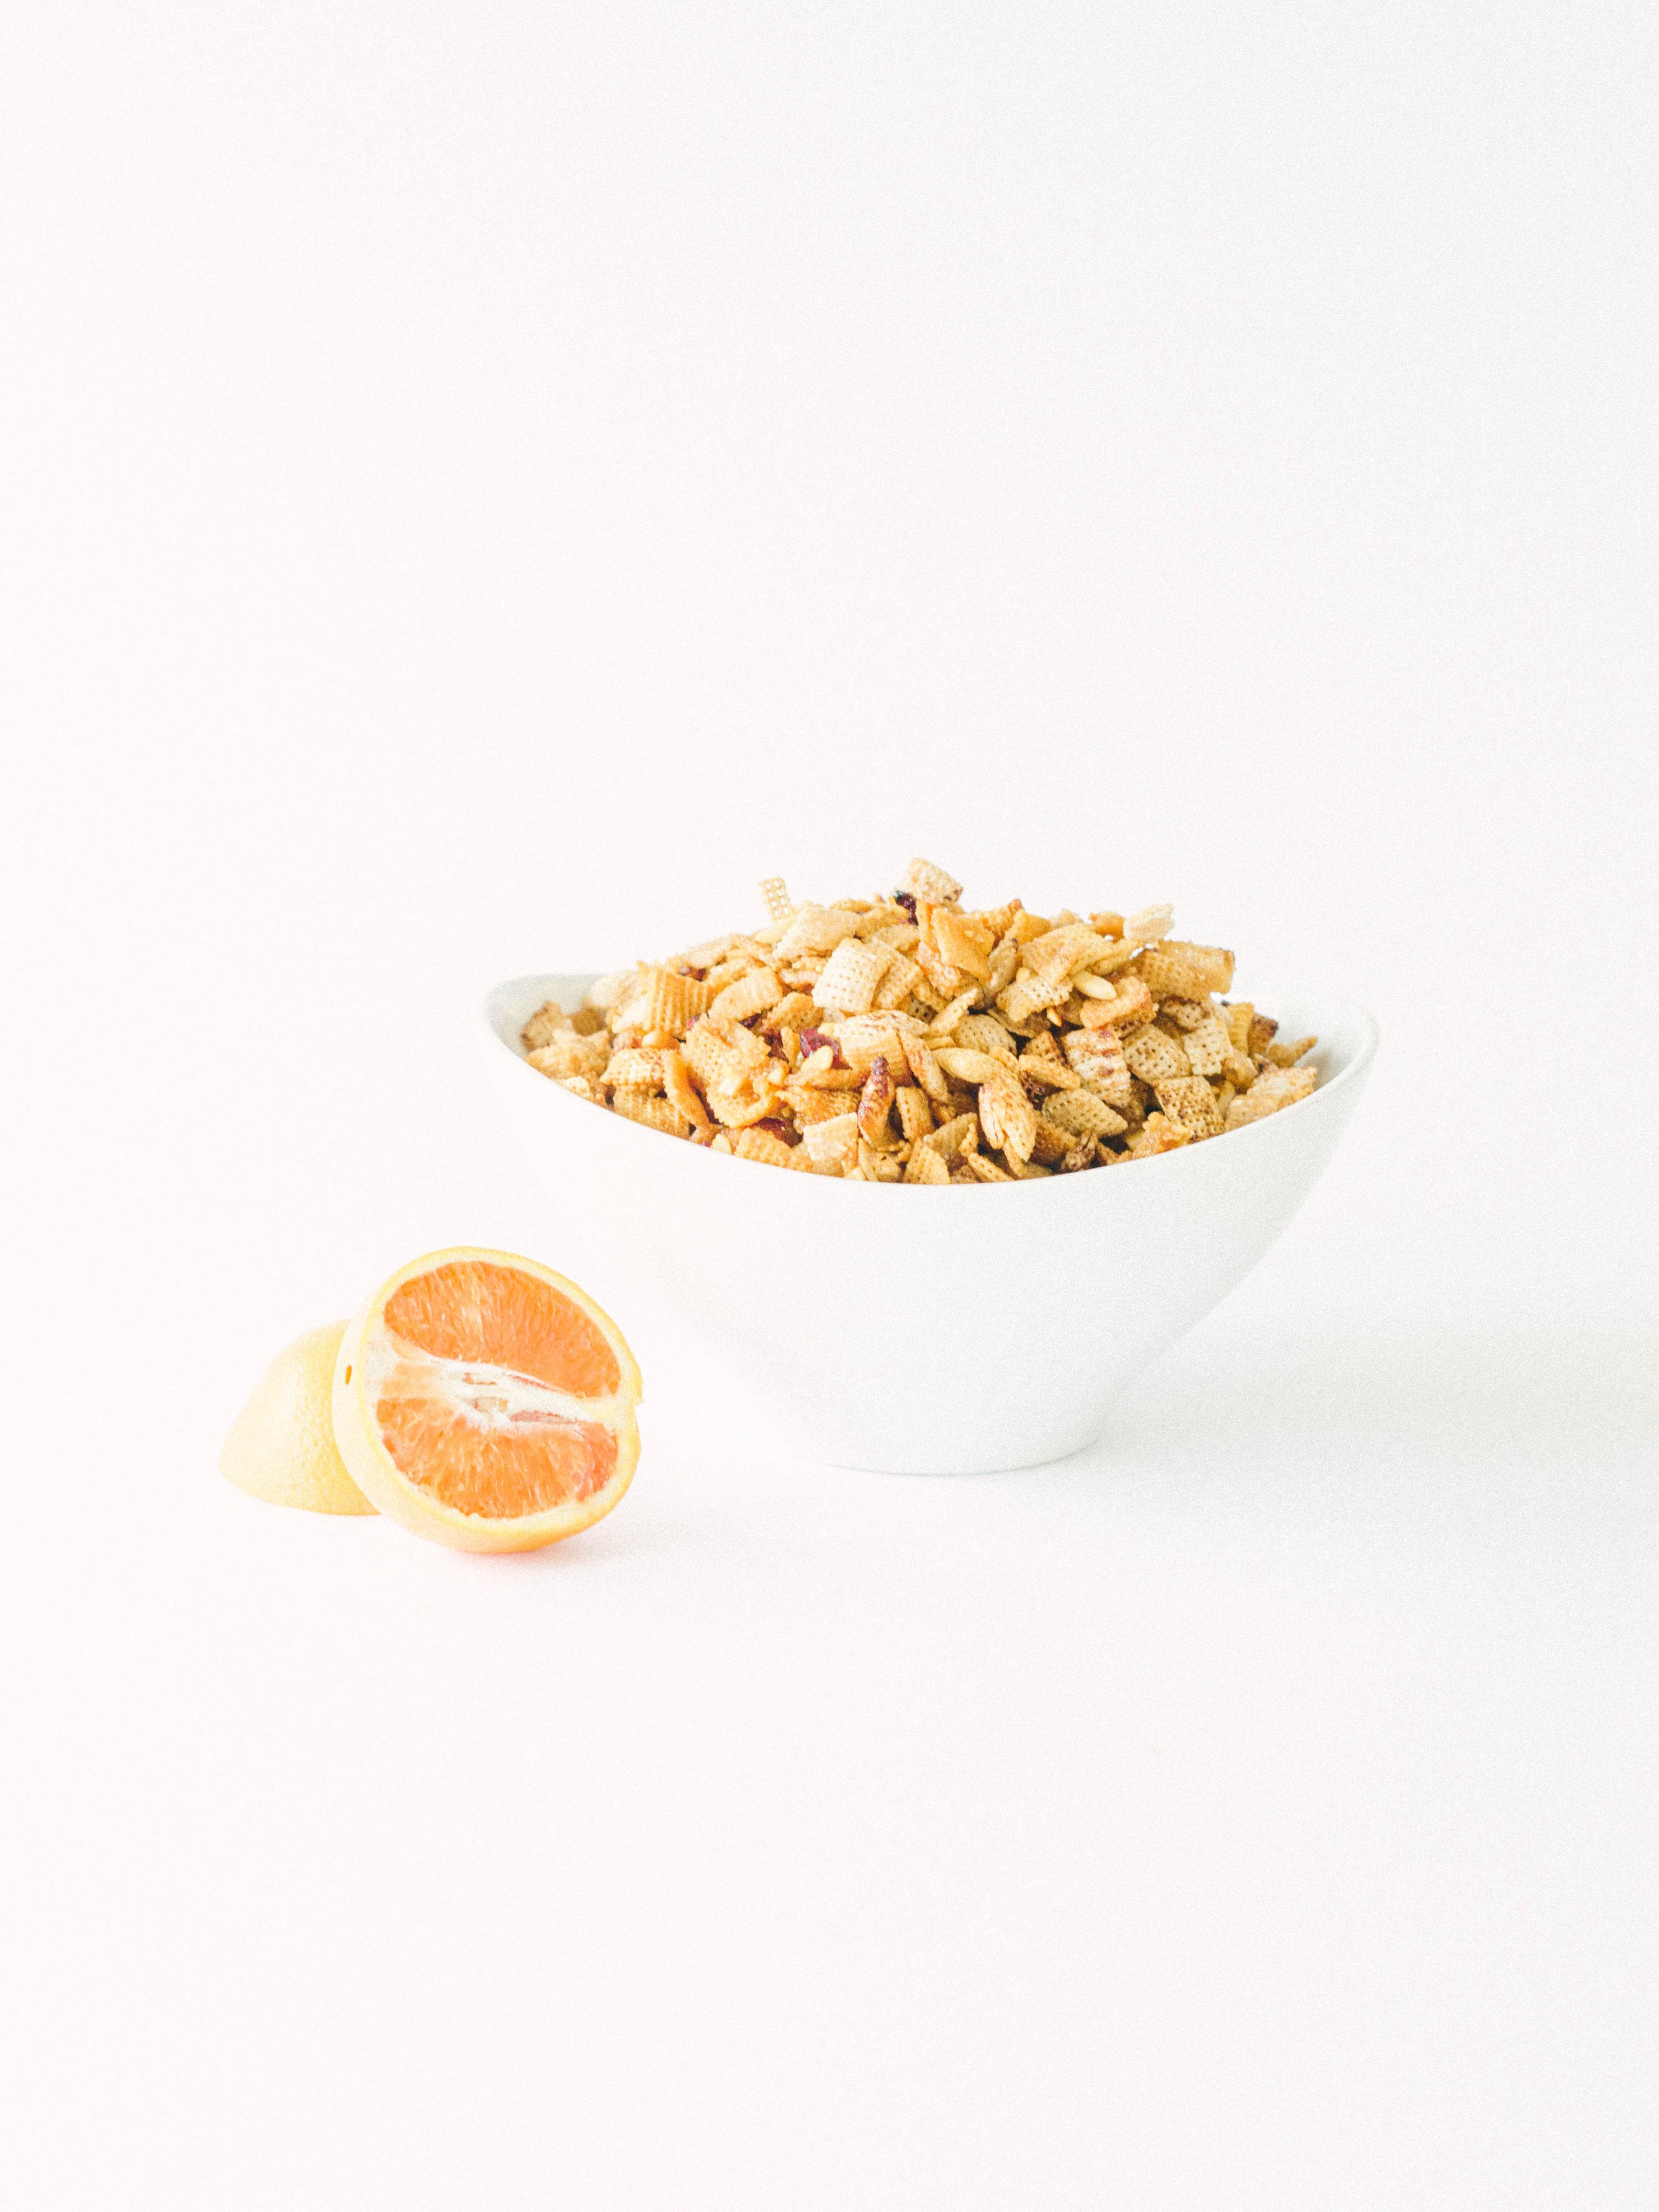 Citrus Berry Trail Mix - Chex Mix Recipe - Rice Chex Mix Recipe - Chex Party Mix - Fall Chex Recipe - Chex Mix Snack Mix Recipe - Chex Mix Gluten Free Mix - Fall Snack - Communikait by Kait Hanson #chexmix #chexrecipe #fall #recipe #glutenfree